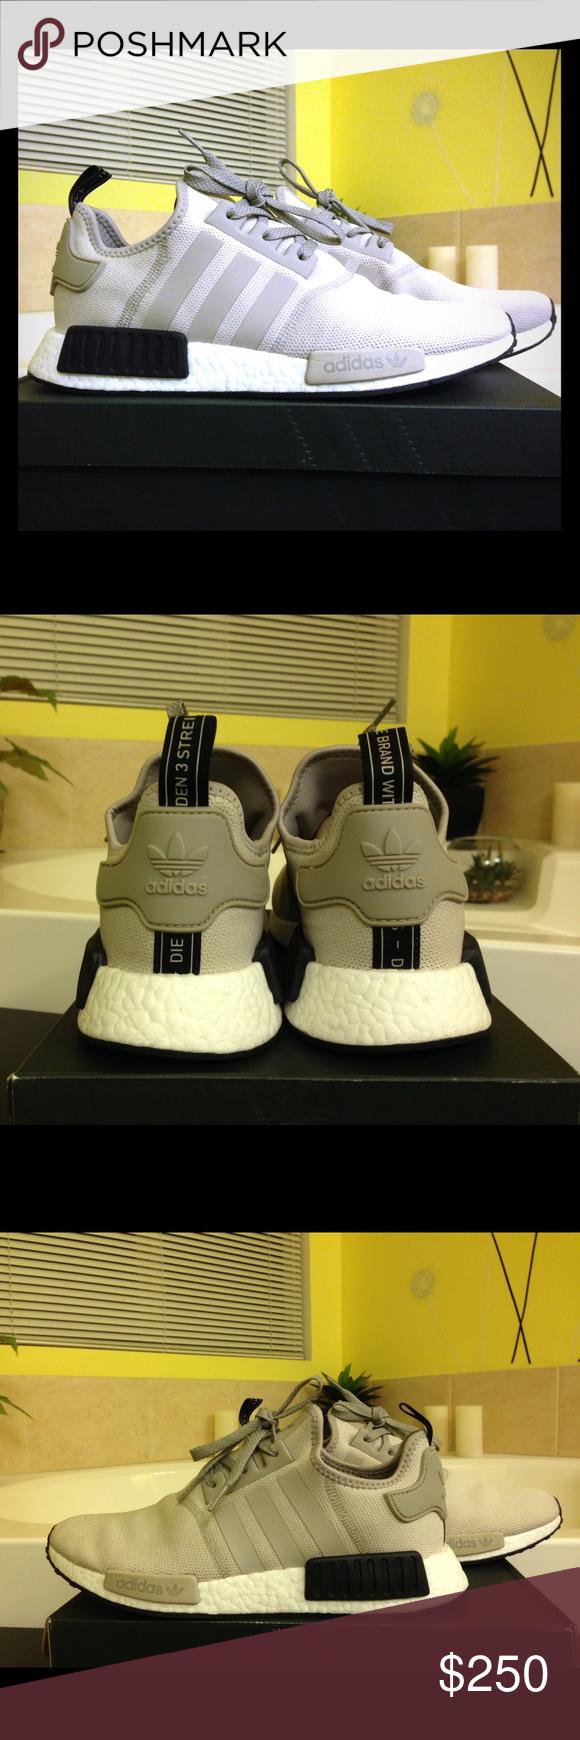 Adidas nmd r1 adidas nmd r1, nmd r1 e adidas nmd